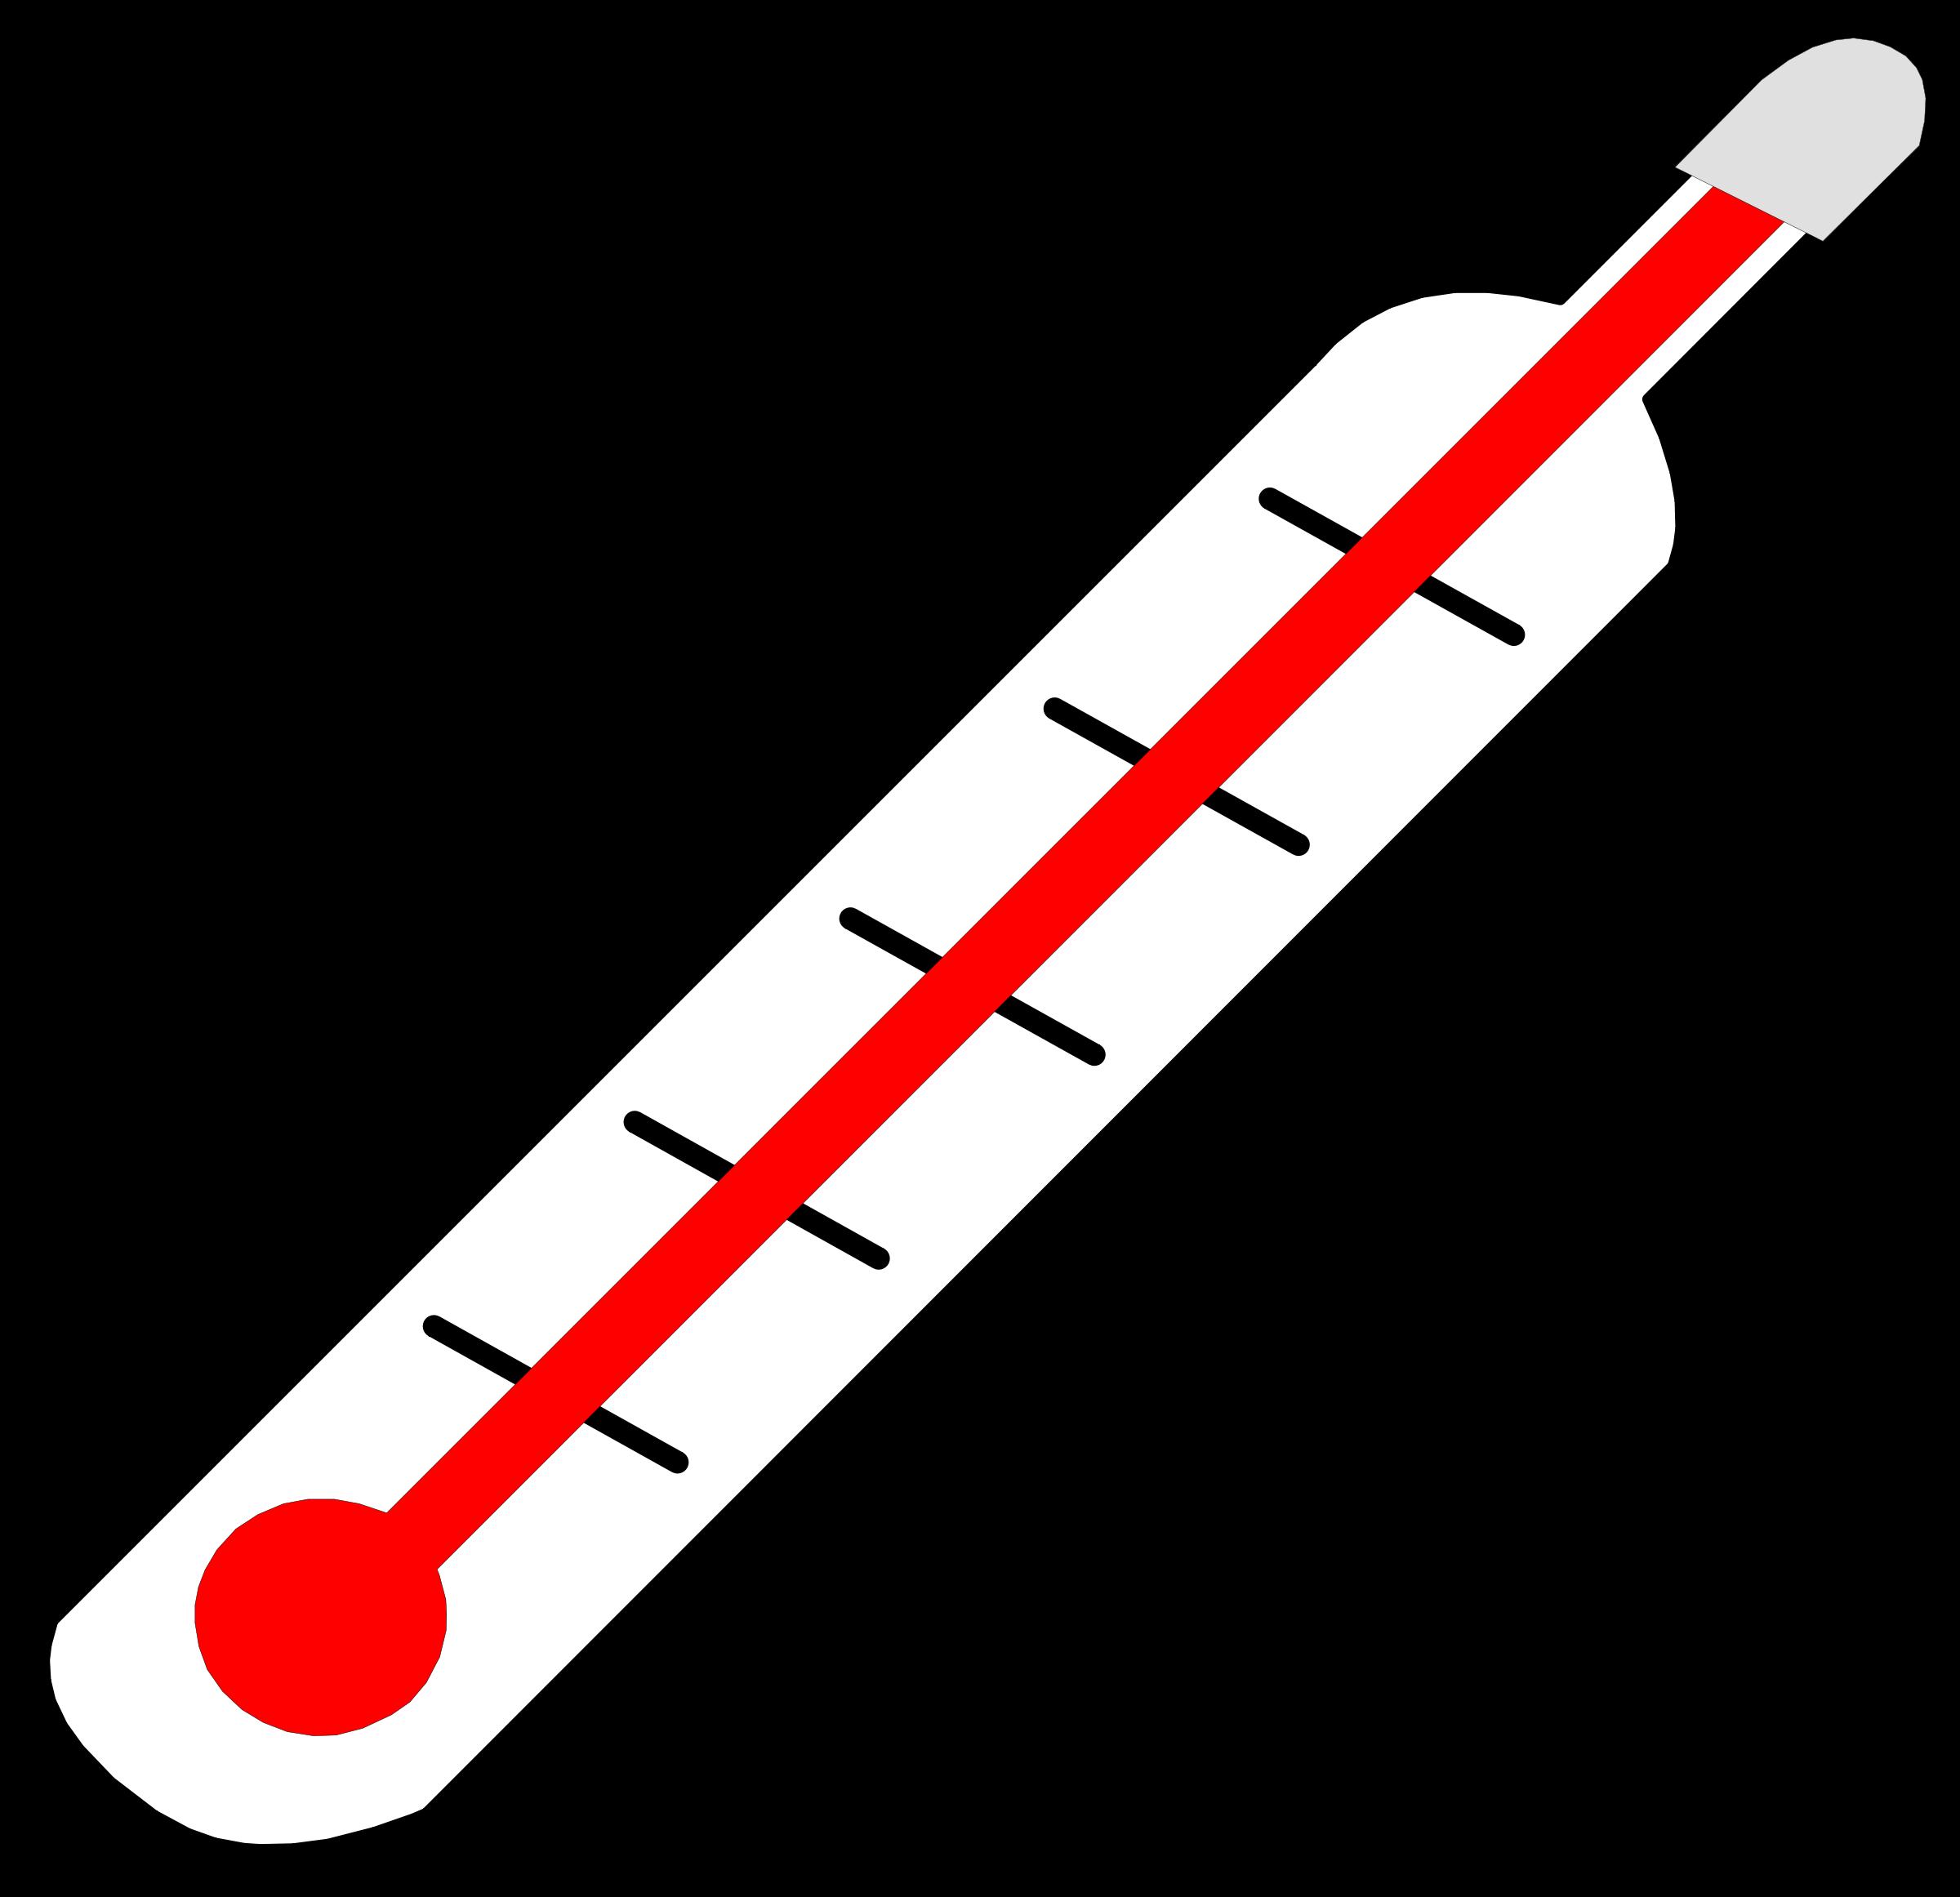 Clip Art Thermometer--11